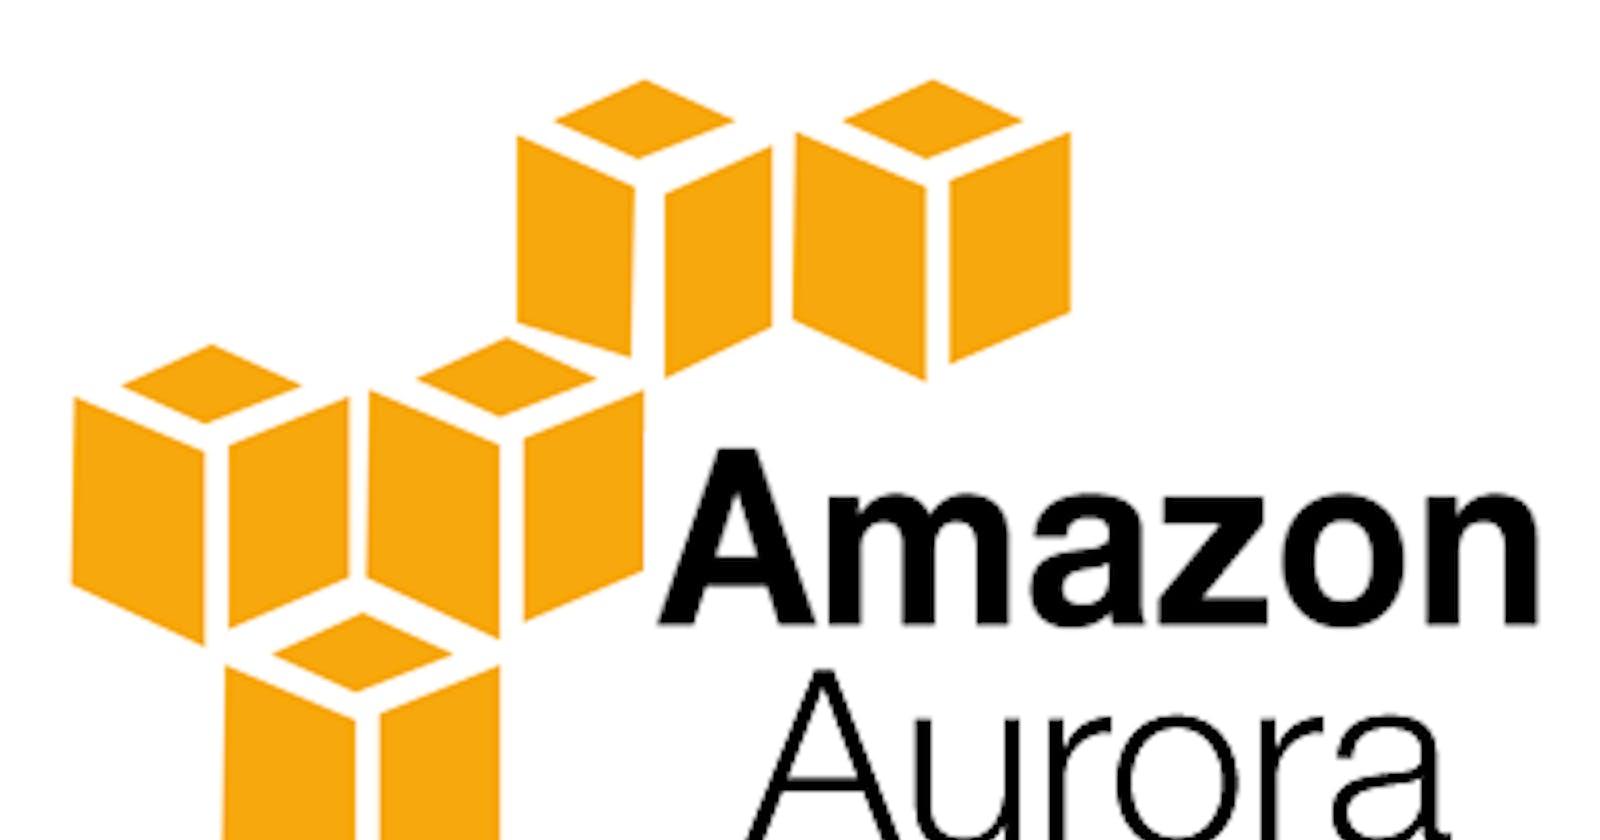 Amazon Aurora: MySQL on Steroids